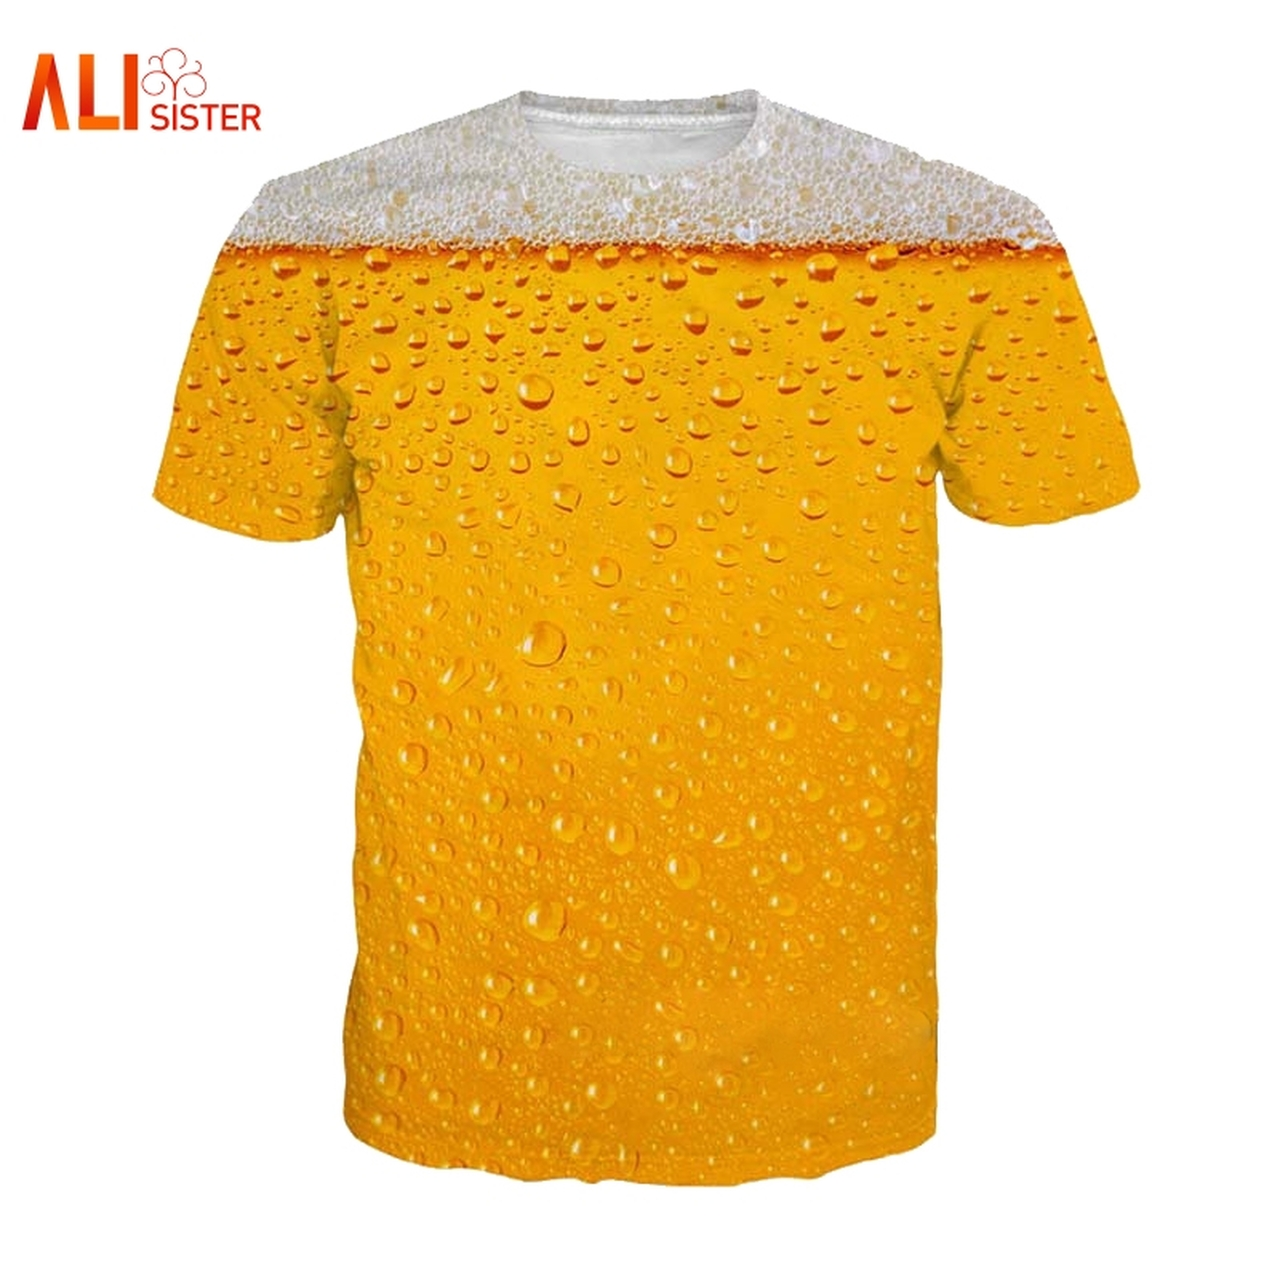 16948efe4 Alisister Beer Print T Shirt It's Time Letter Women Men Funny Novelty T- shirt Short ...